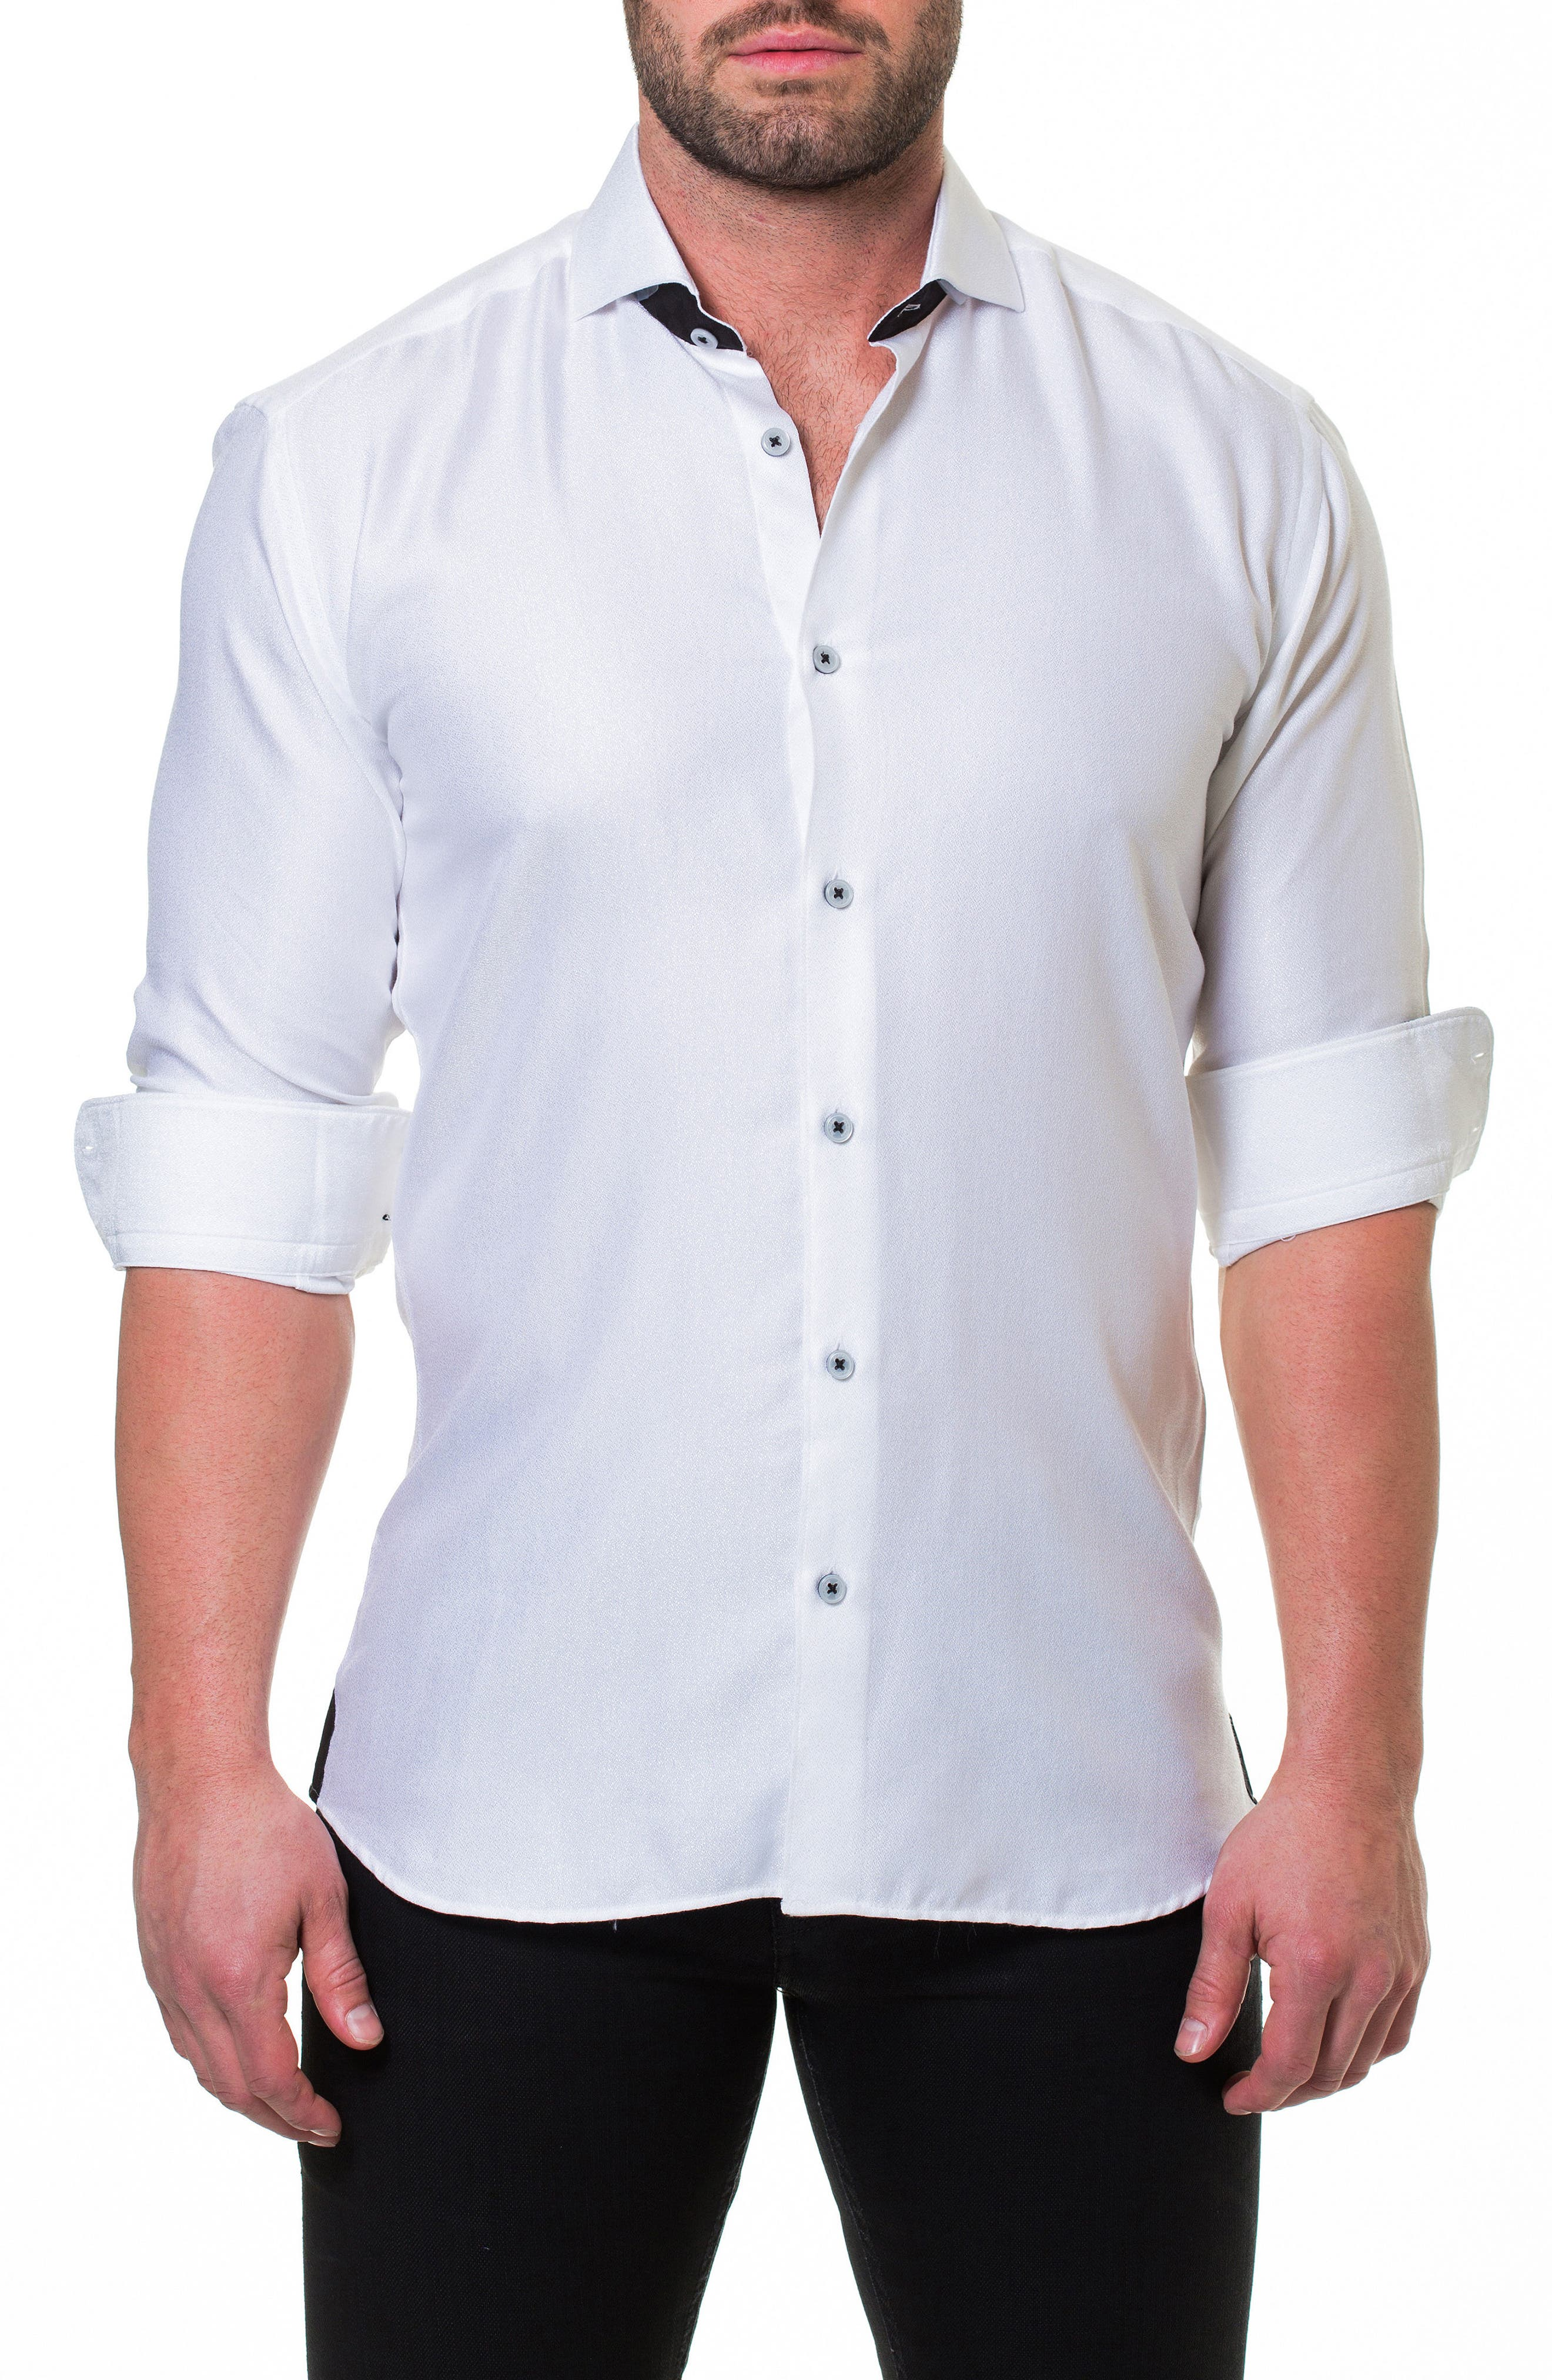 Wall Street Serenity White Slim Fit Sport Shirt,                             Alternate thumbnail 4, color,                             110